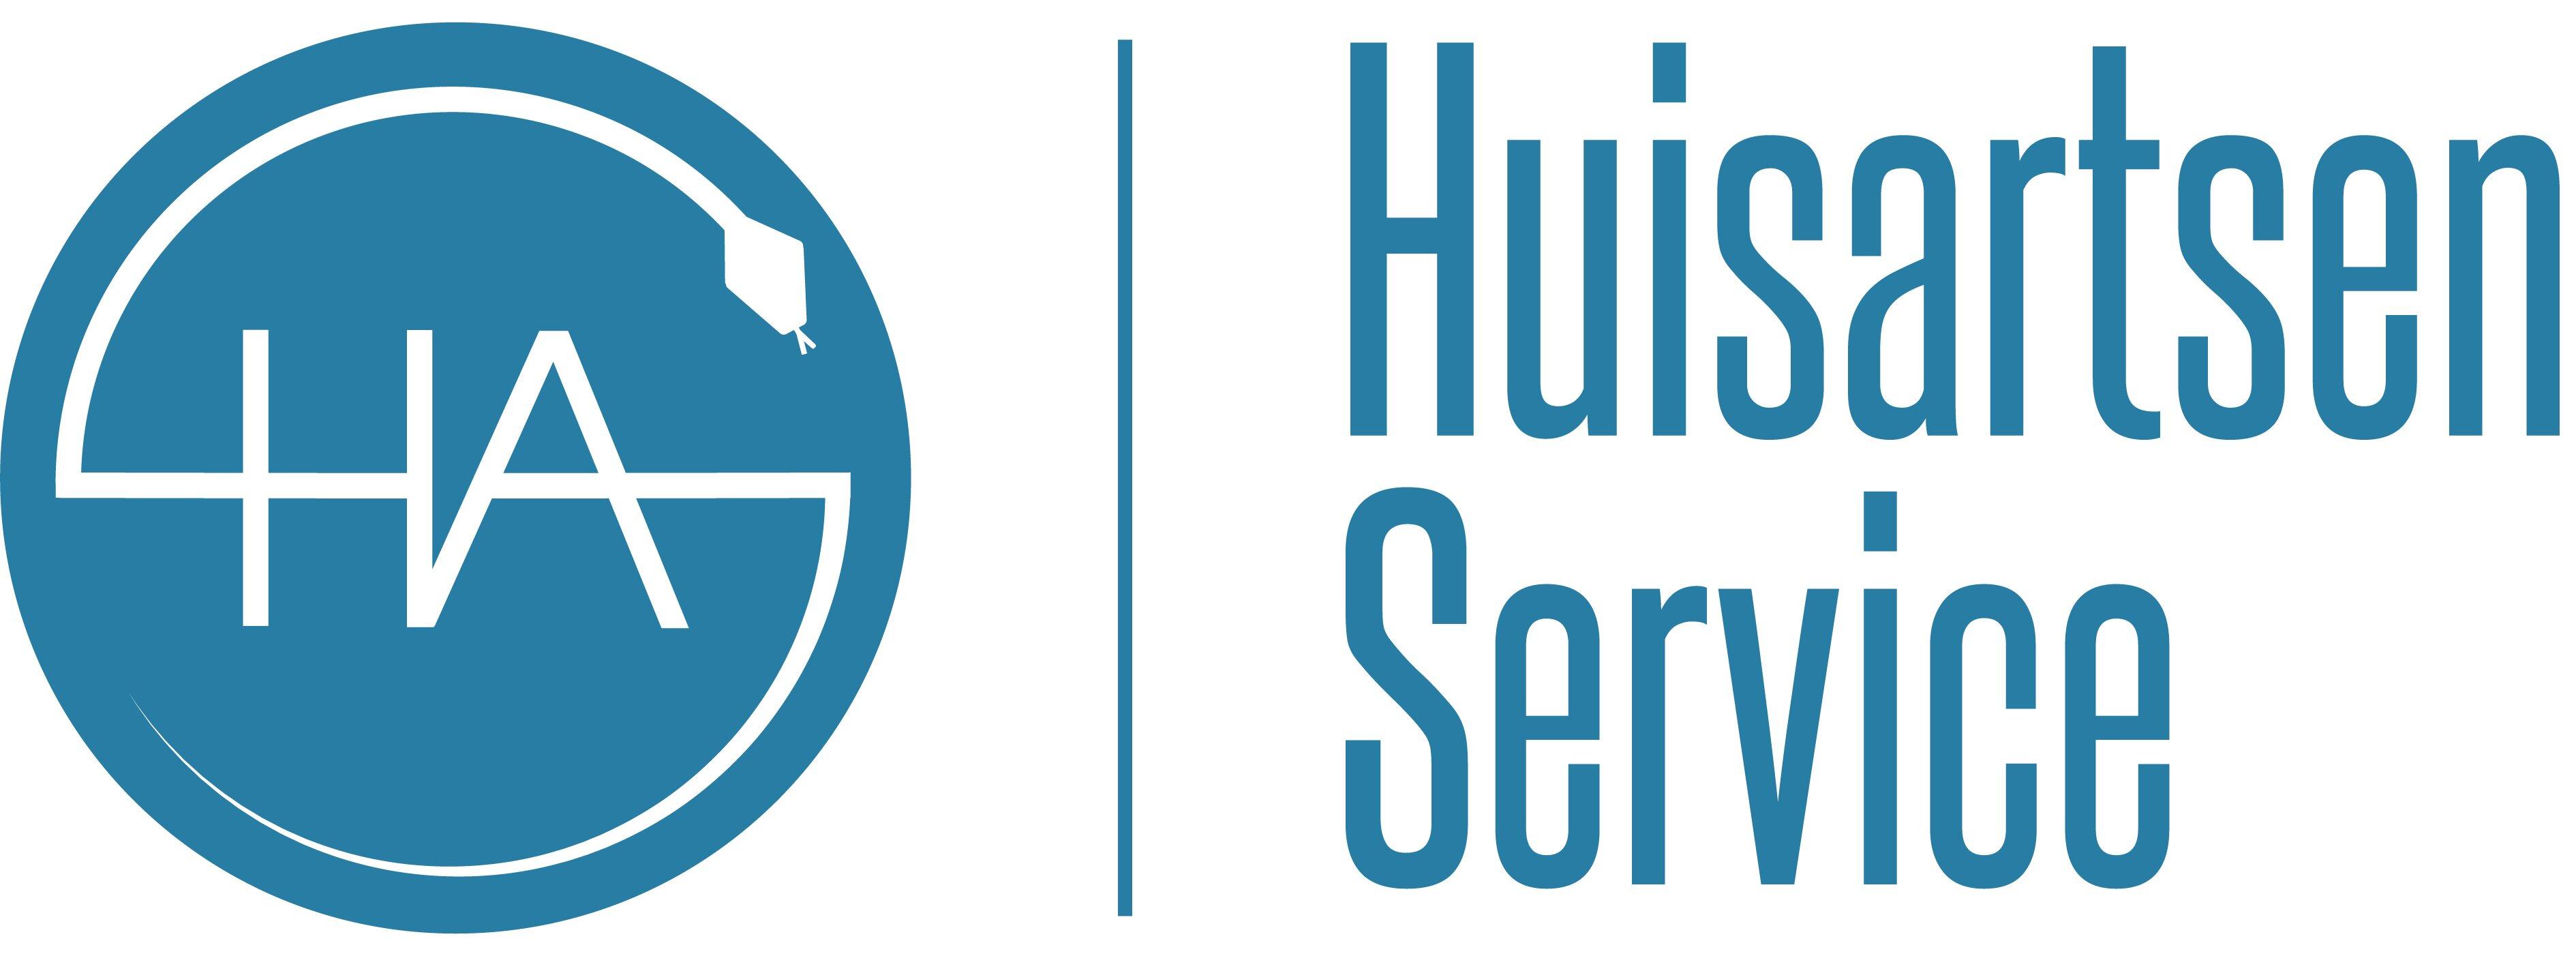 logo-has-def.jpg